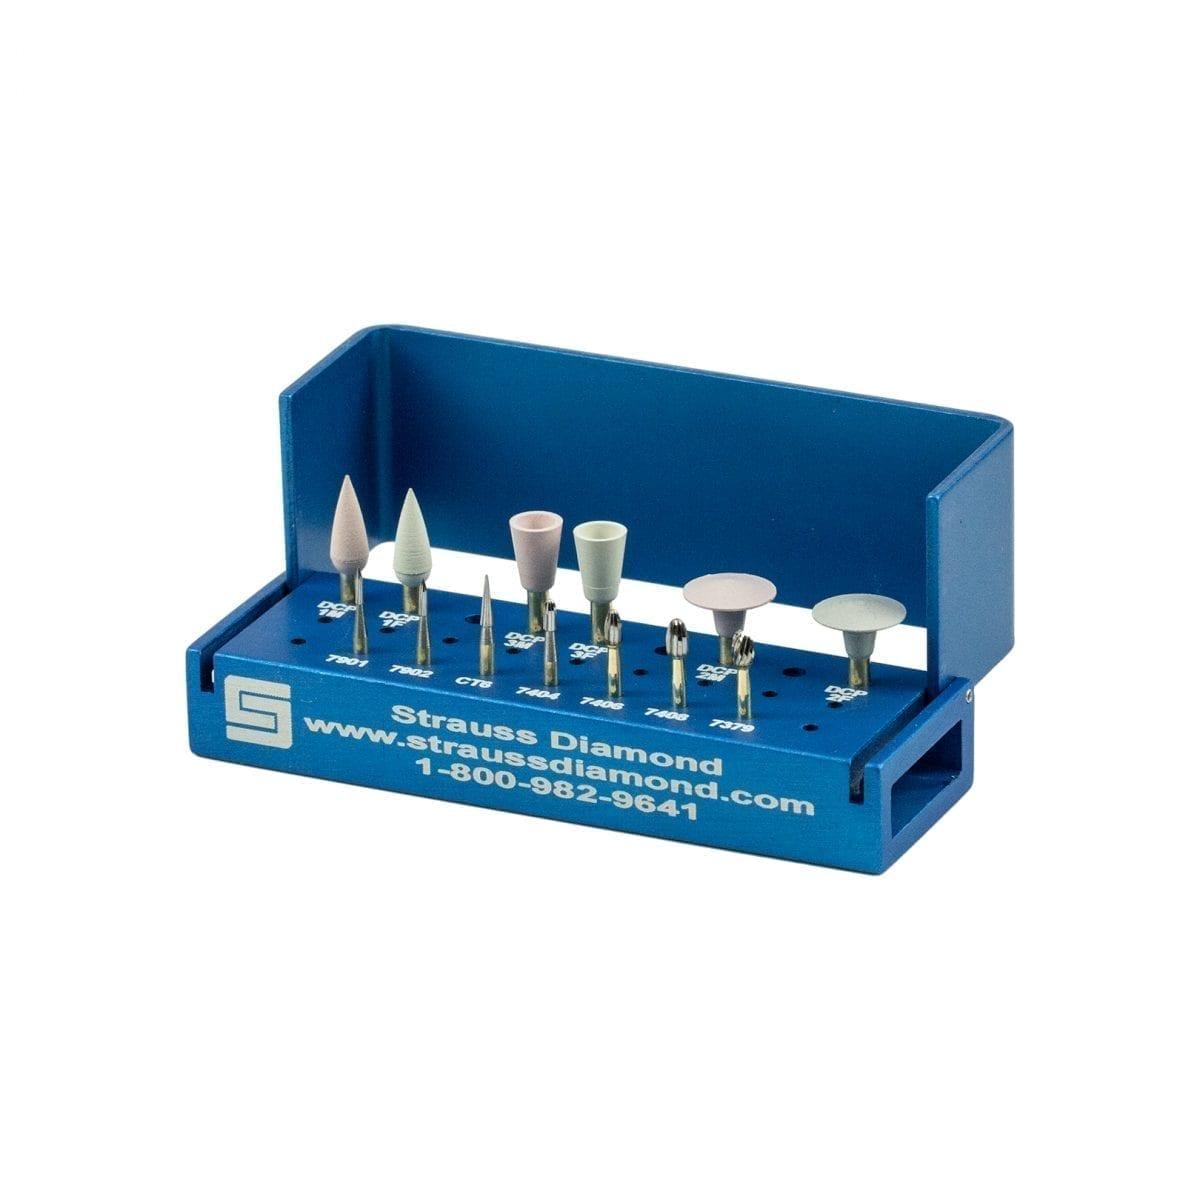 Composite Finishing System 1 – Strauss Diamond Instruments, Inc.